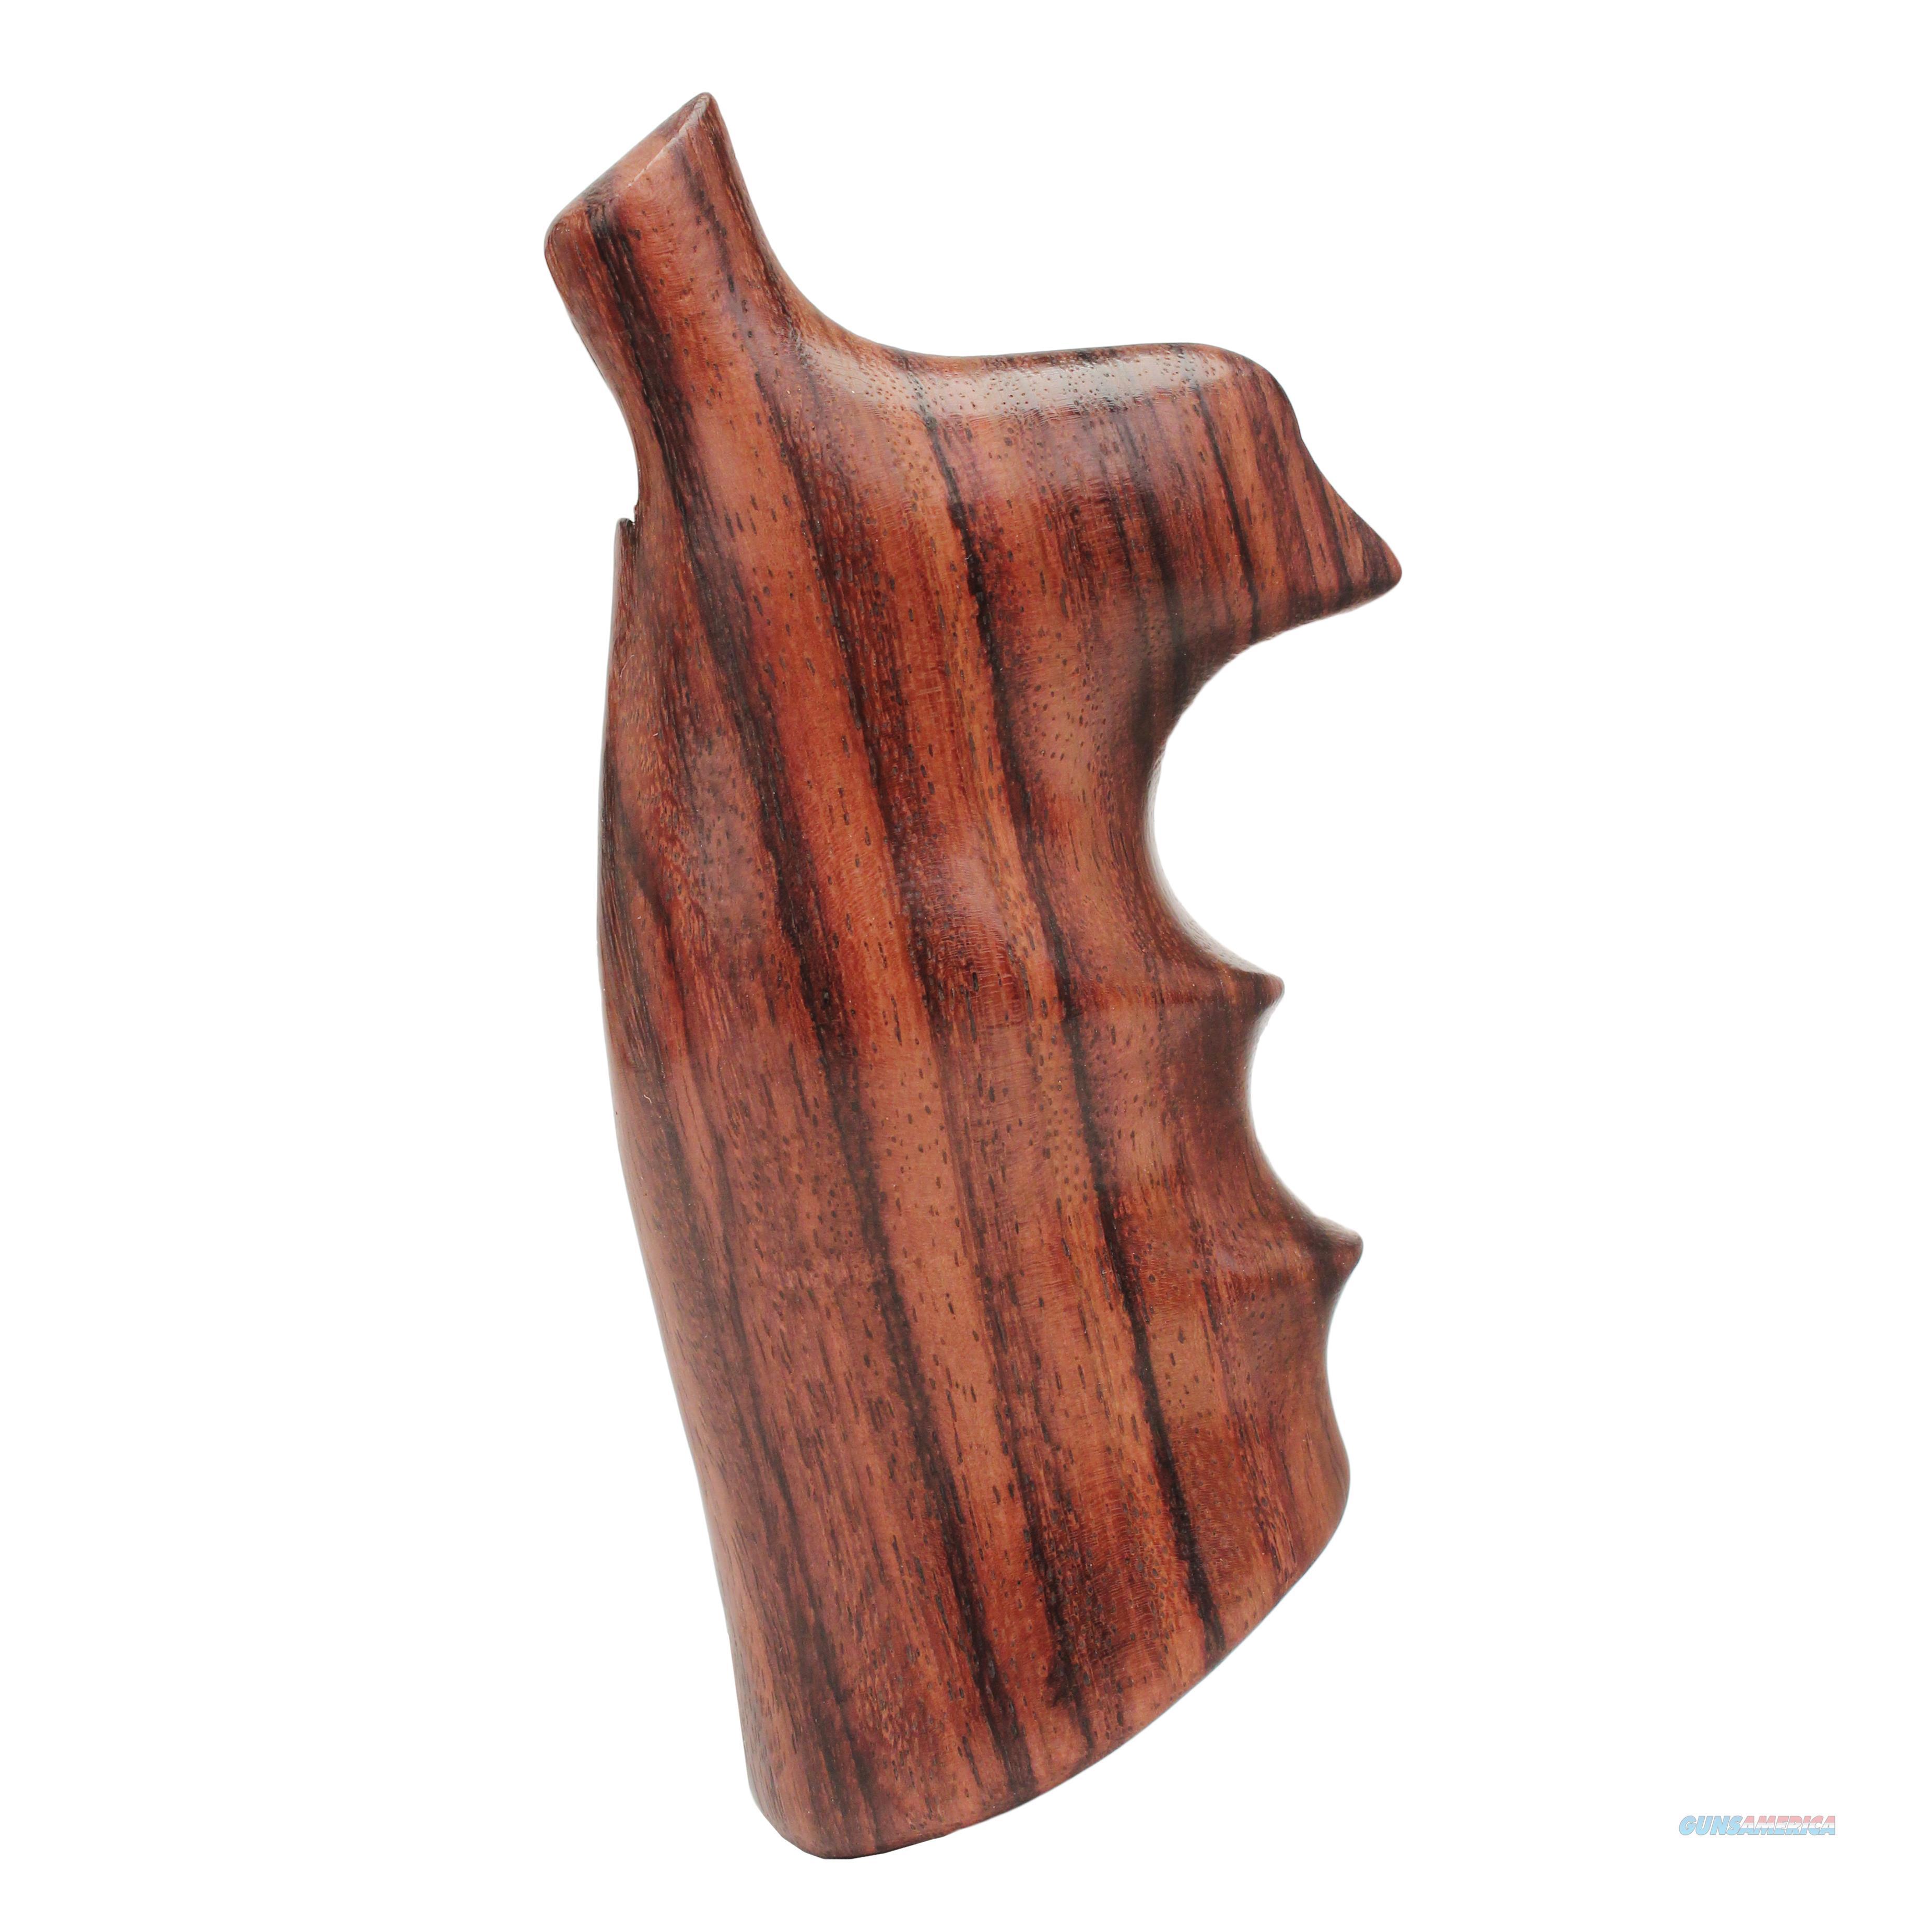 Hogue S&W N Frame Square Butt Grips 29900  Non-Guns > Gunstocks, Grips & Wood